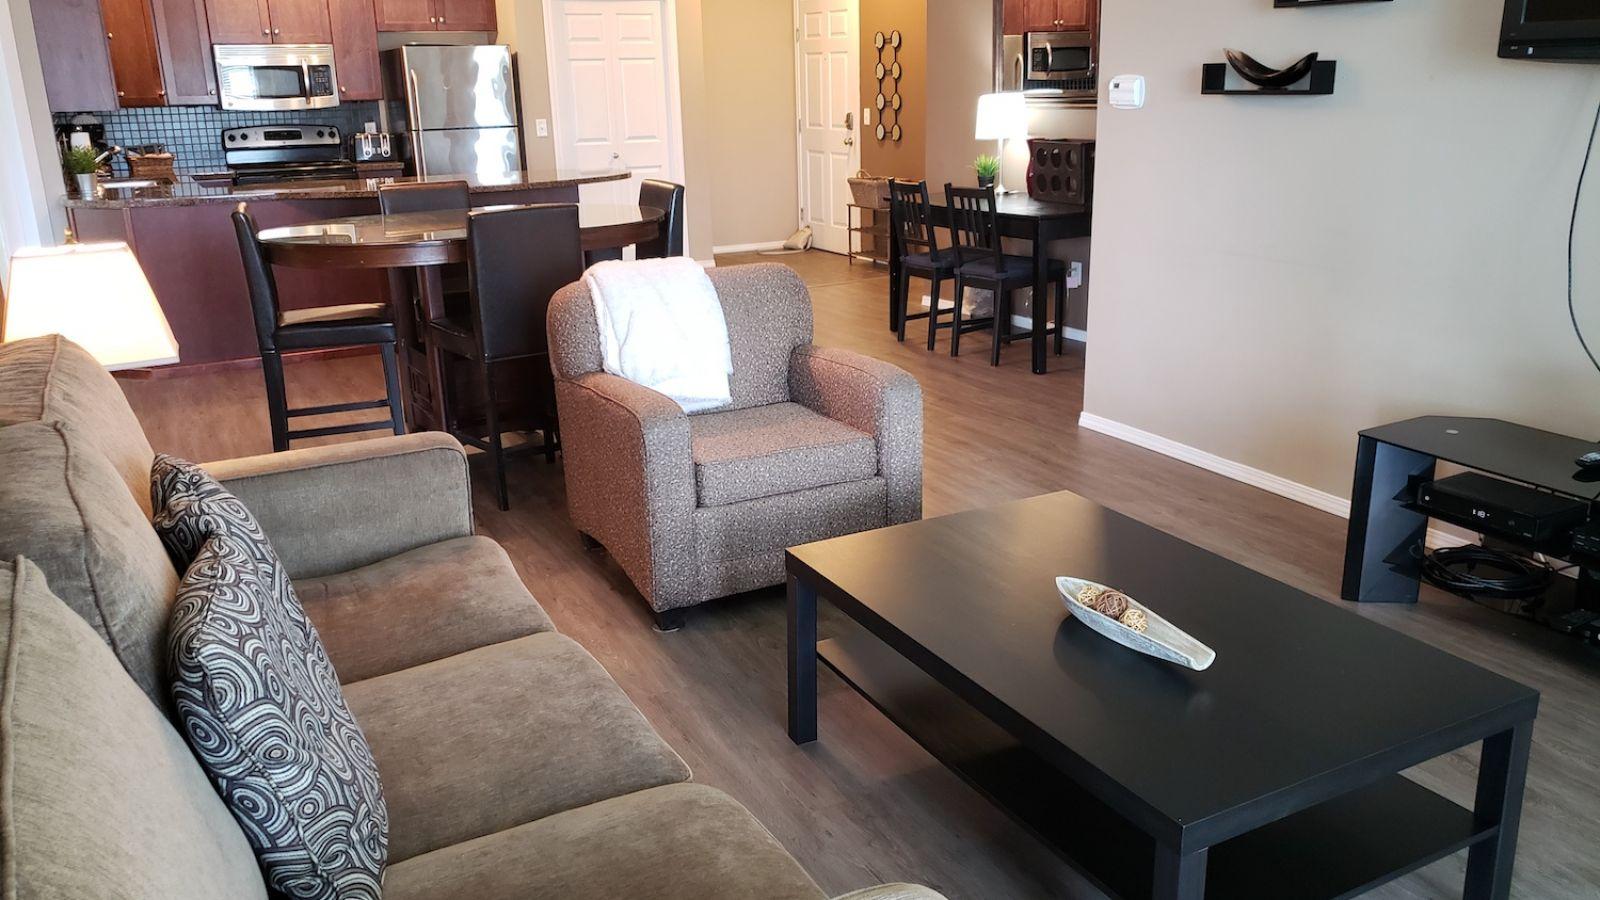 Pinnacle Condos - typical living rooms